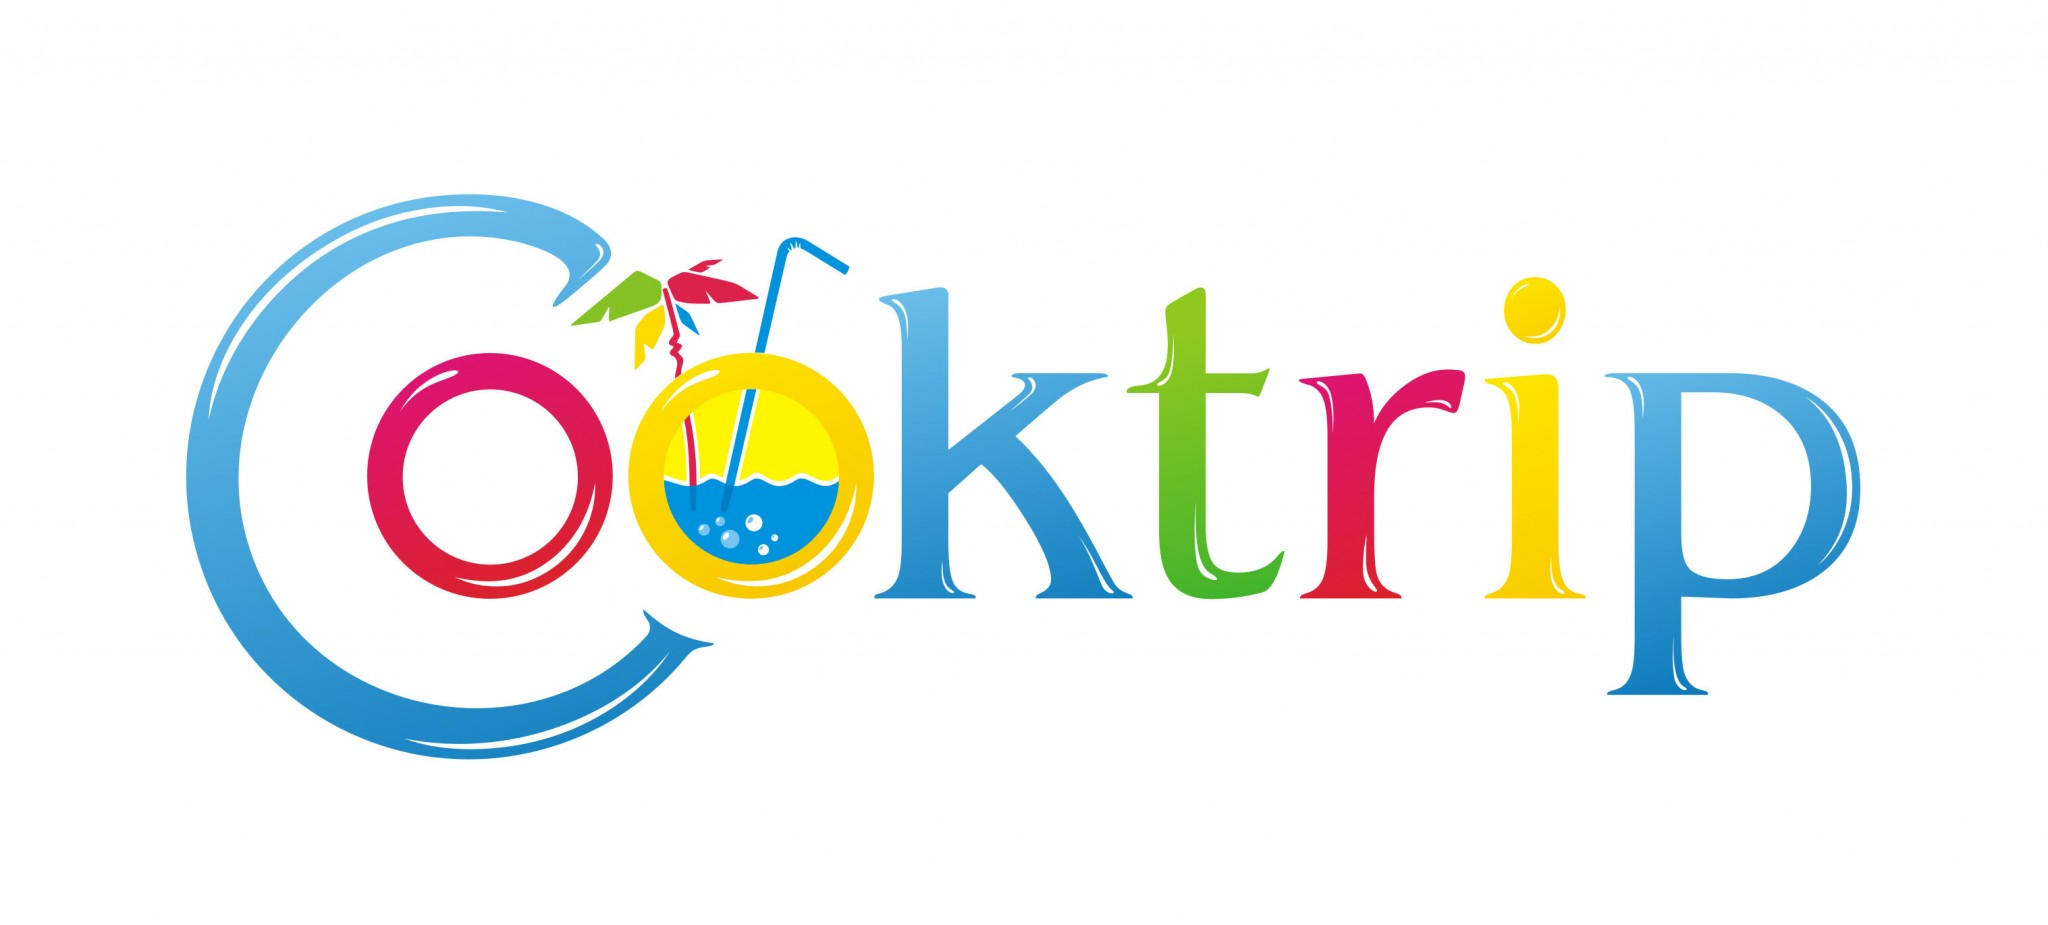 логотип Cooktrip куктрип